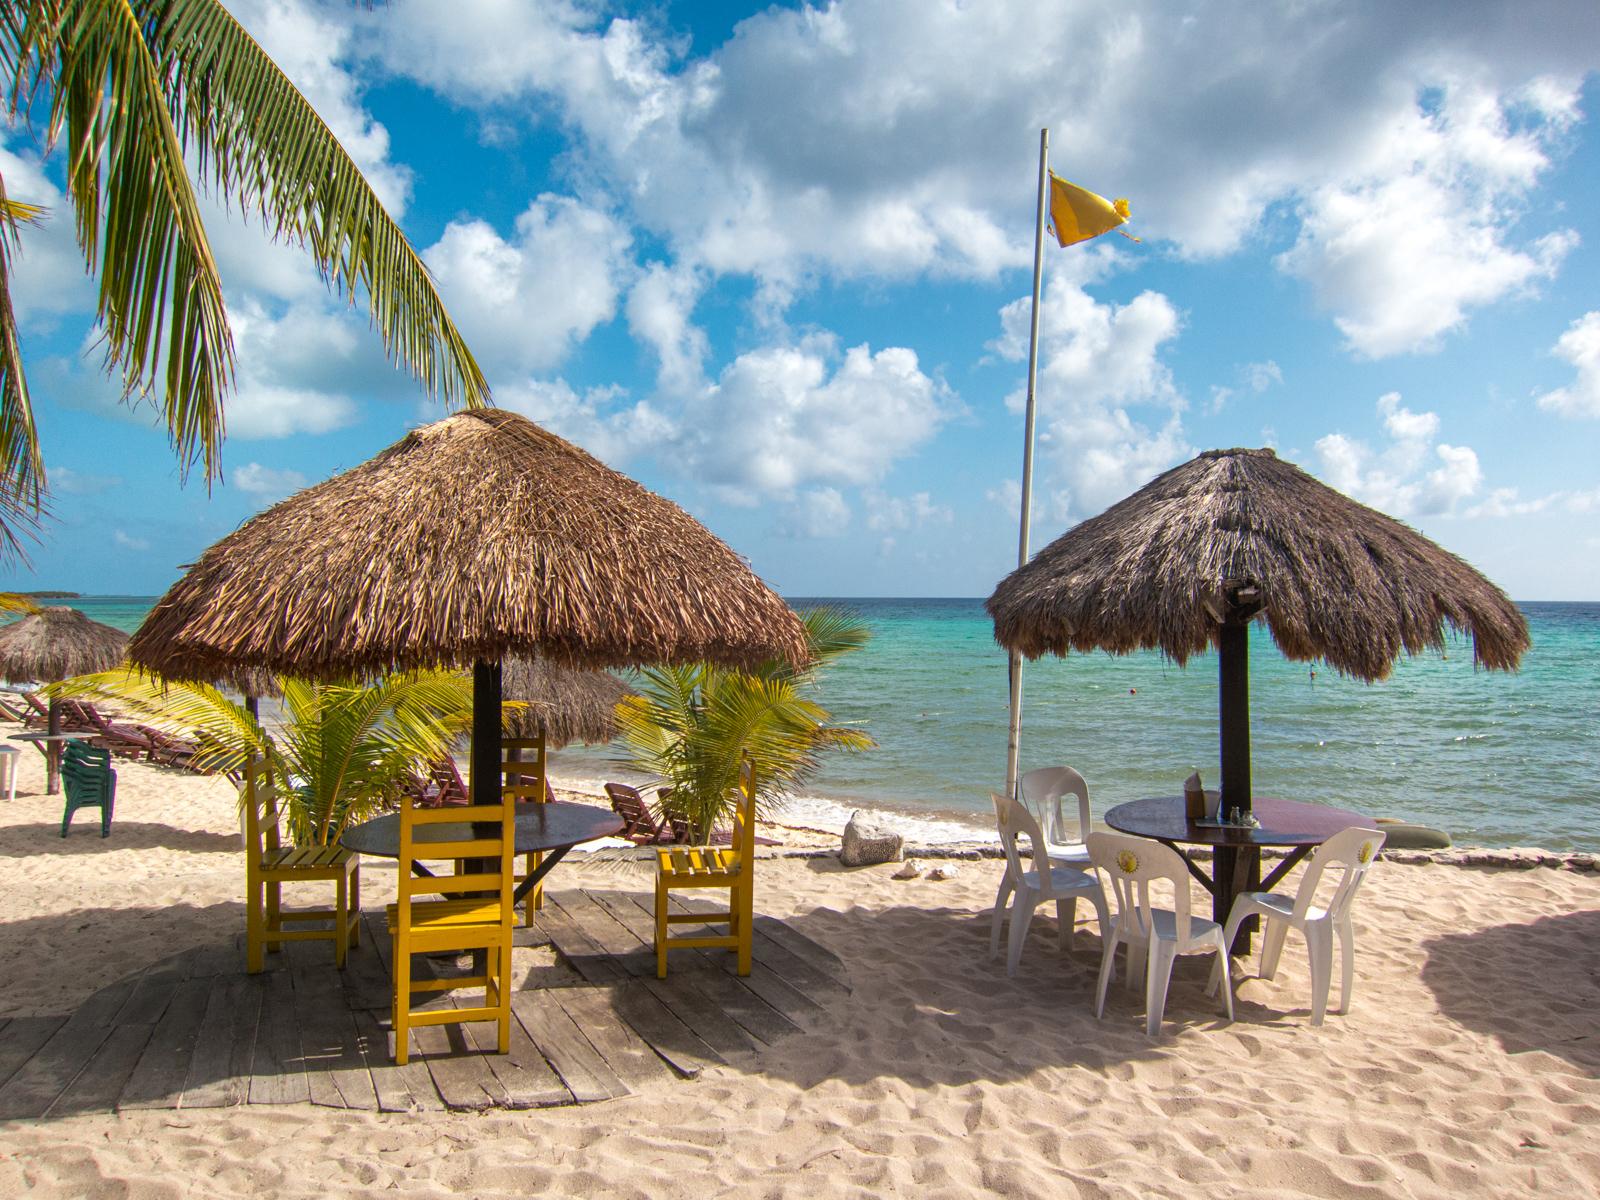 Playa Palancar on Cozumel island